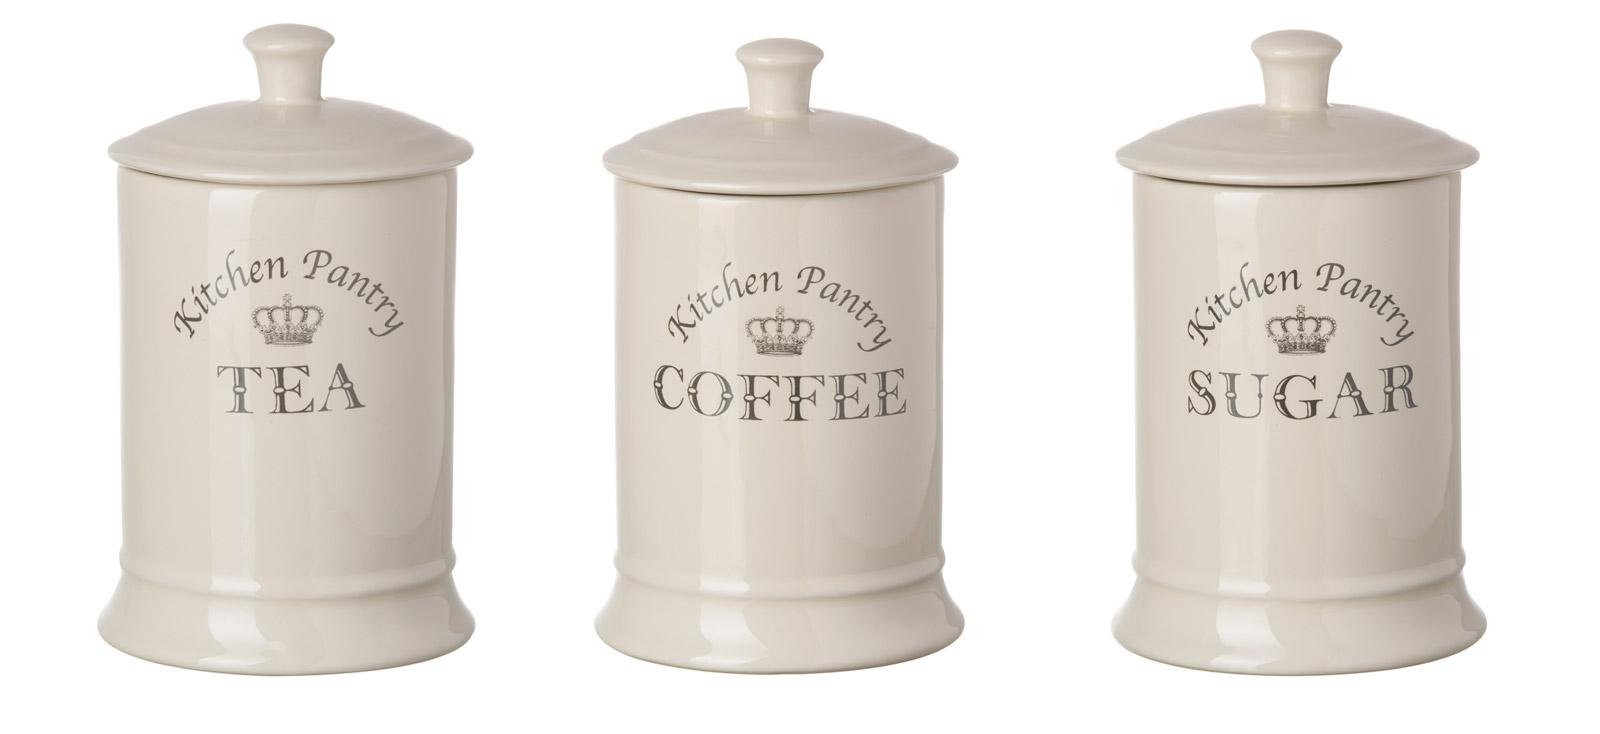 majestic cream tea coffee sugar canisters set kitchen. Black Bedroom Furniture Sets. Home Design Ideas